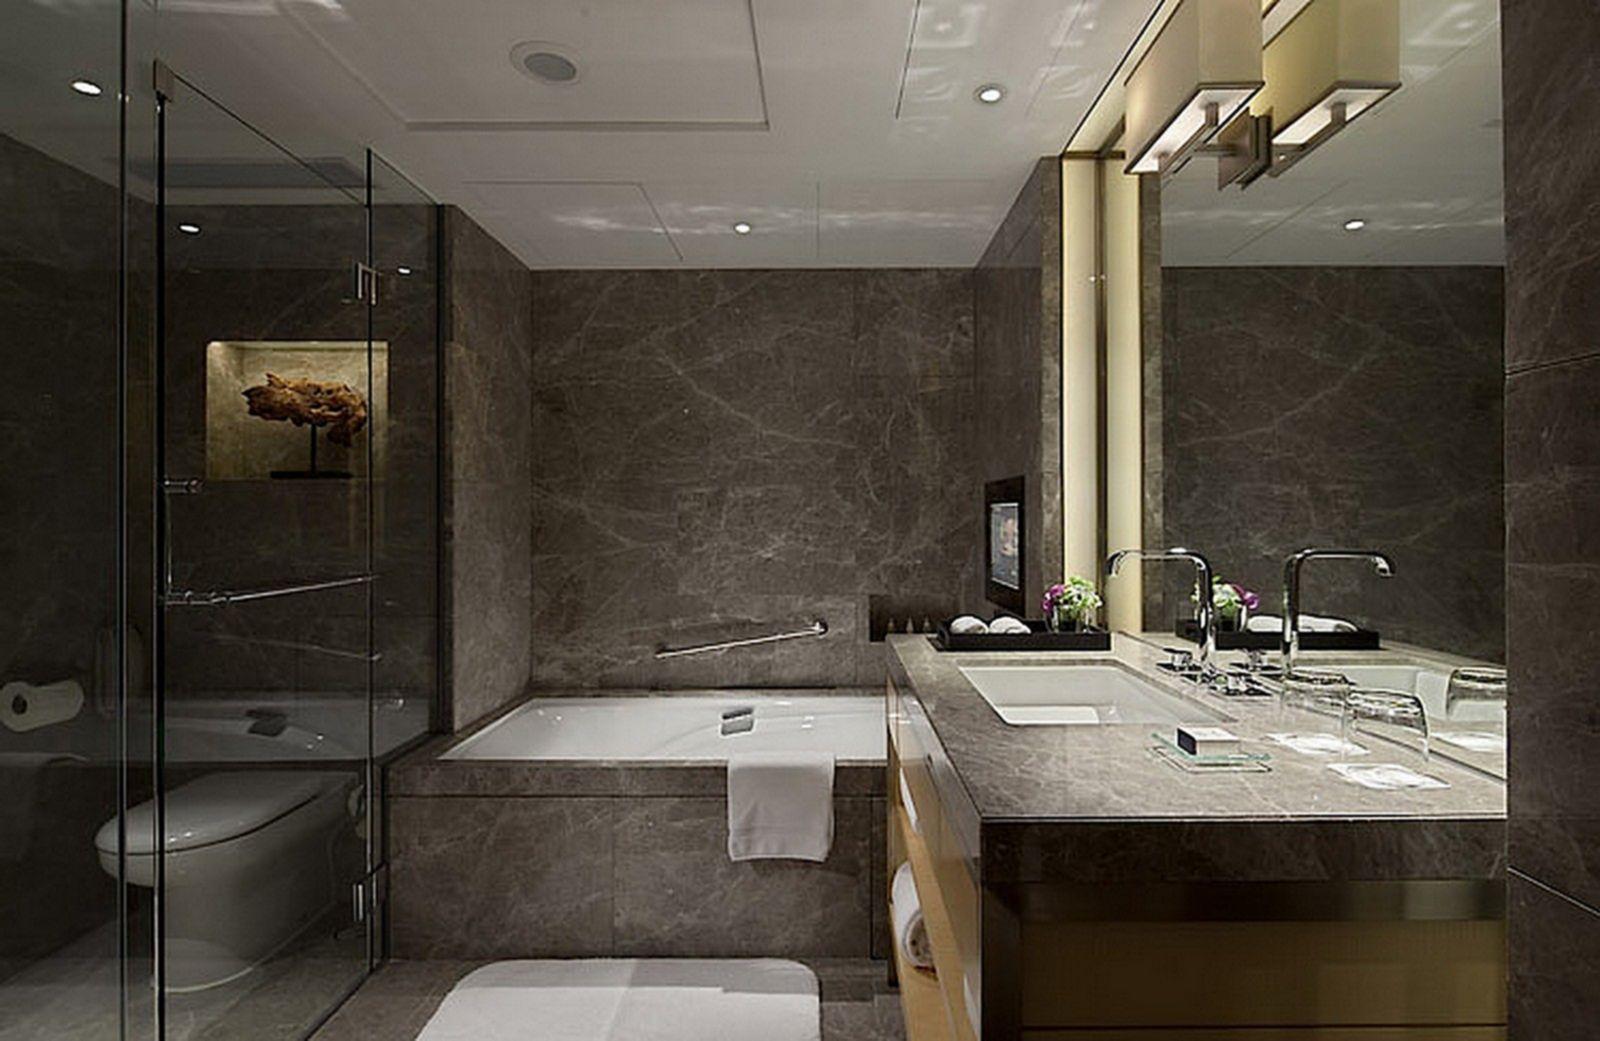 Brilliant Best 20 Bathroom Design Ideas Like 5 Stars Hotel Https